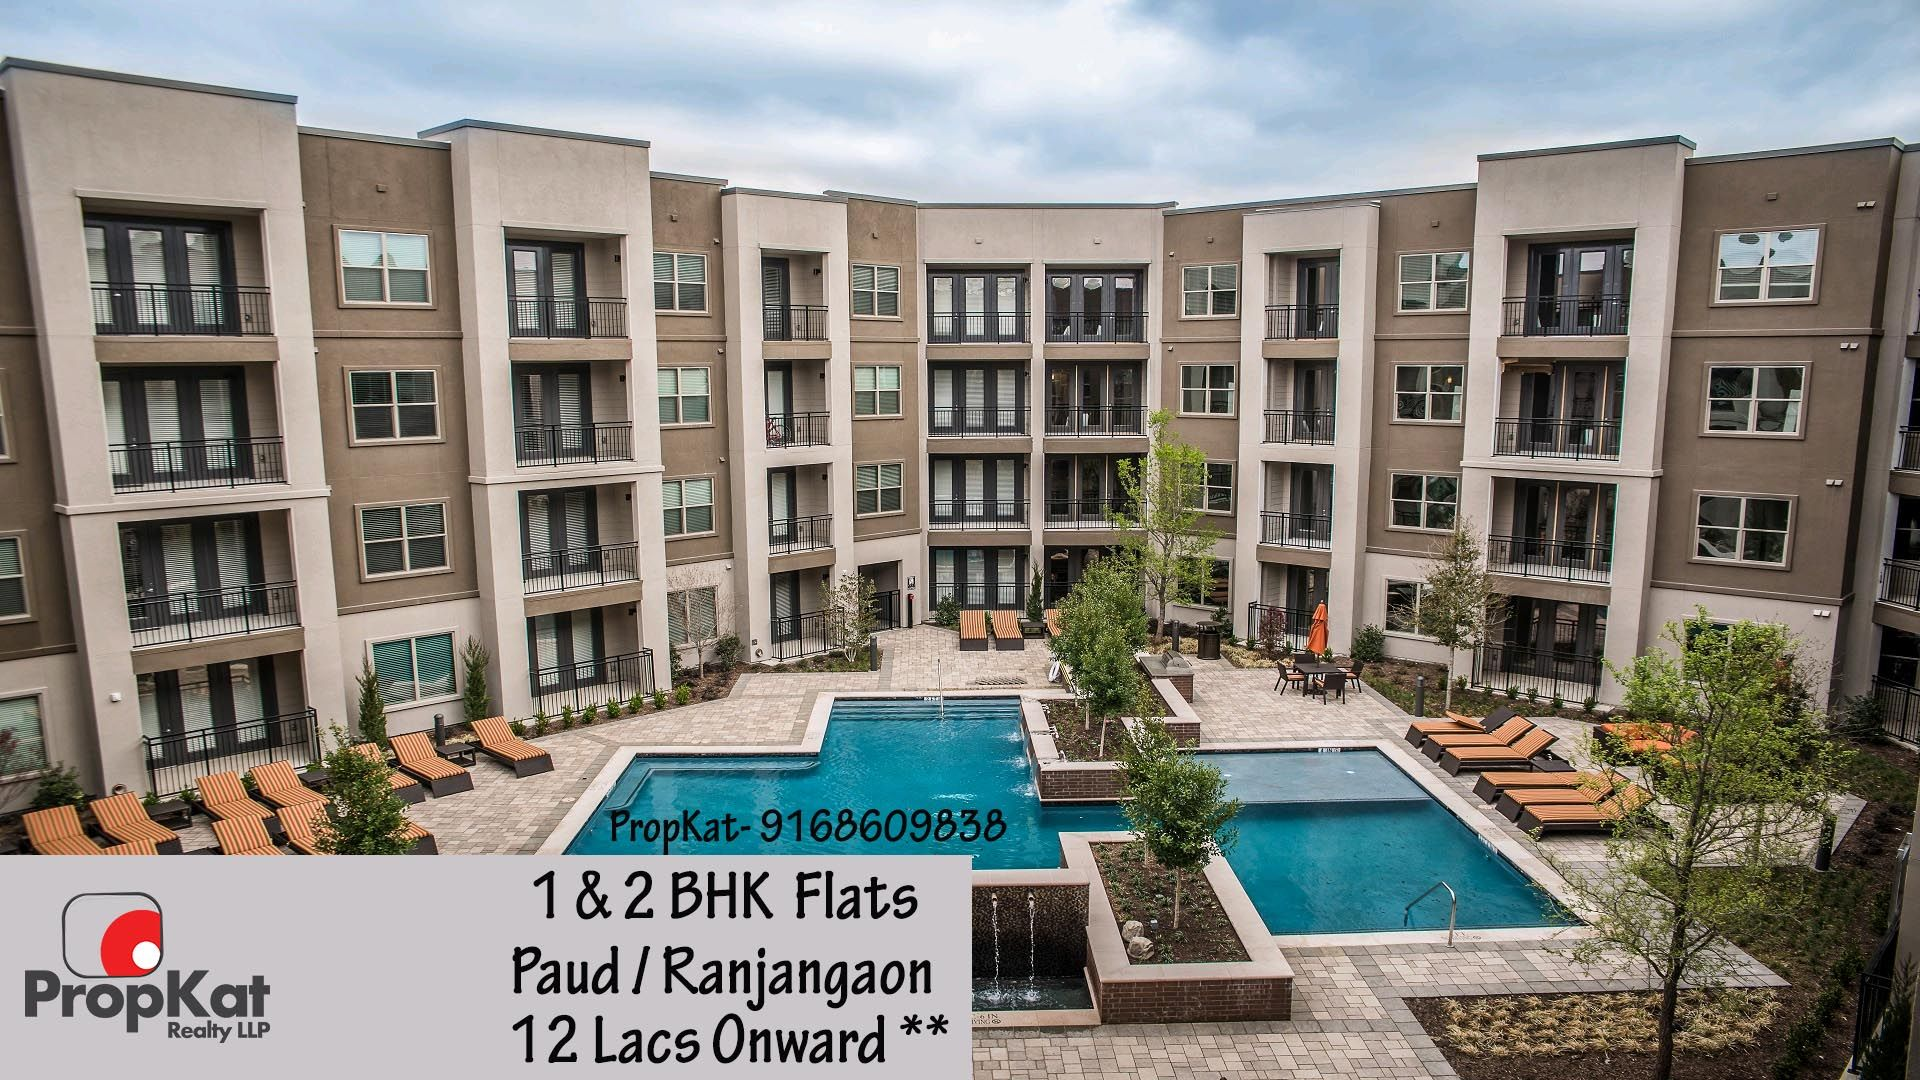 1 2 Bhk Flats Paud Ranjangaon 12 Lacs Onward Propkat 9168609838 Pune Paud Ranjangaon Flatsinpune 1bhk Berkshire Views House Styles